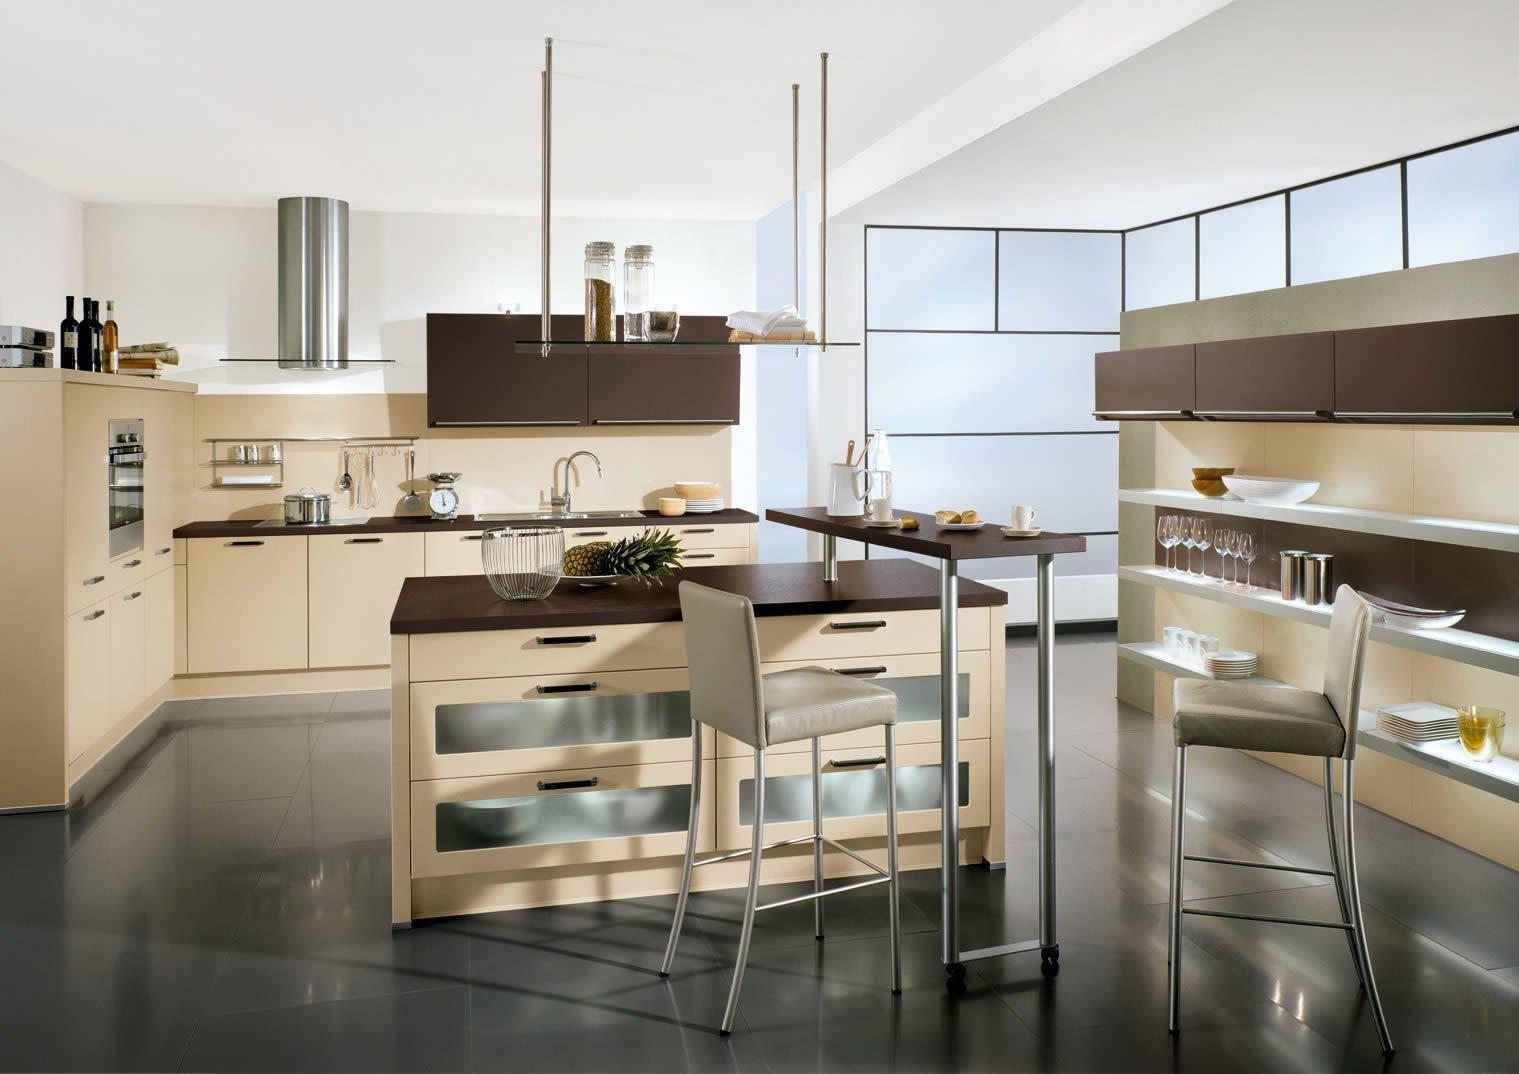 Latte Kitchen Decor ~ Home & Interior Design In Cafe Latte Kitchen Wall Art (Image 17 of 20)